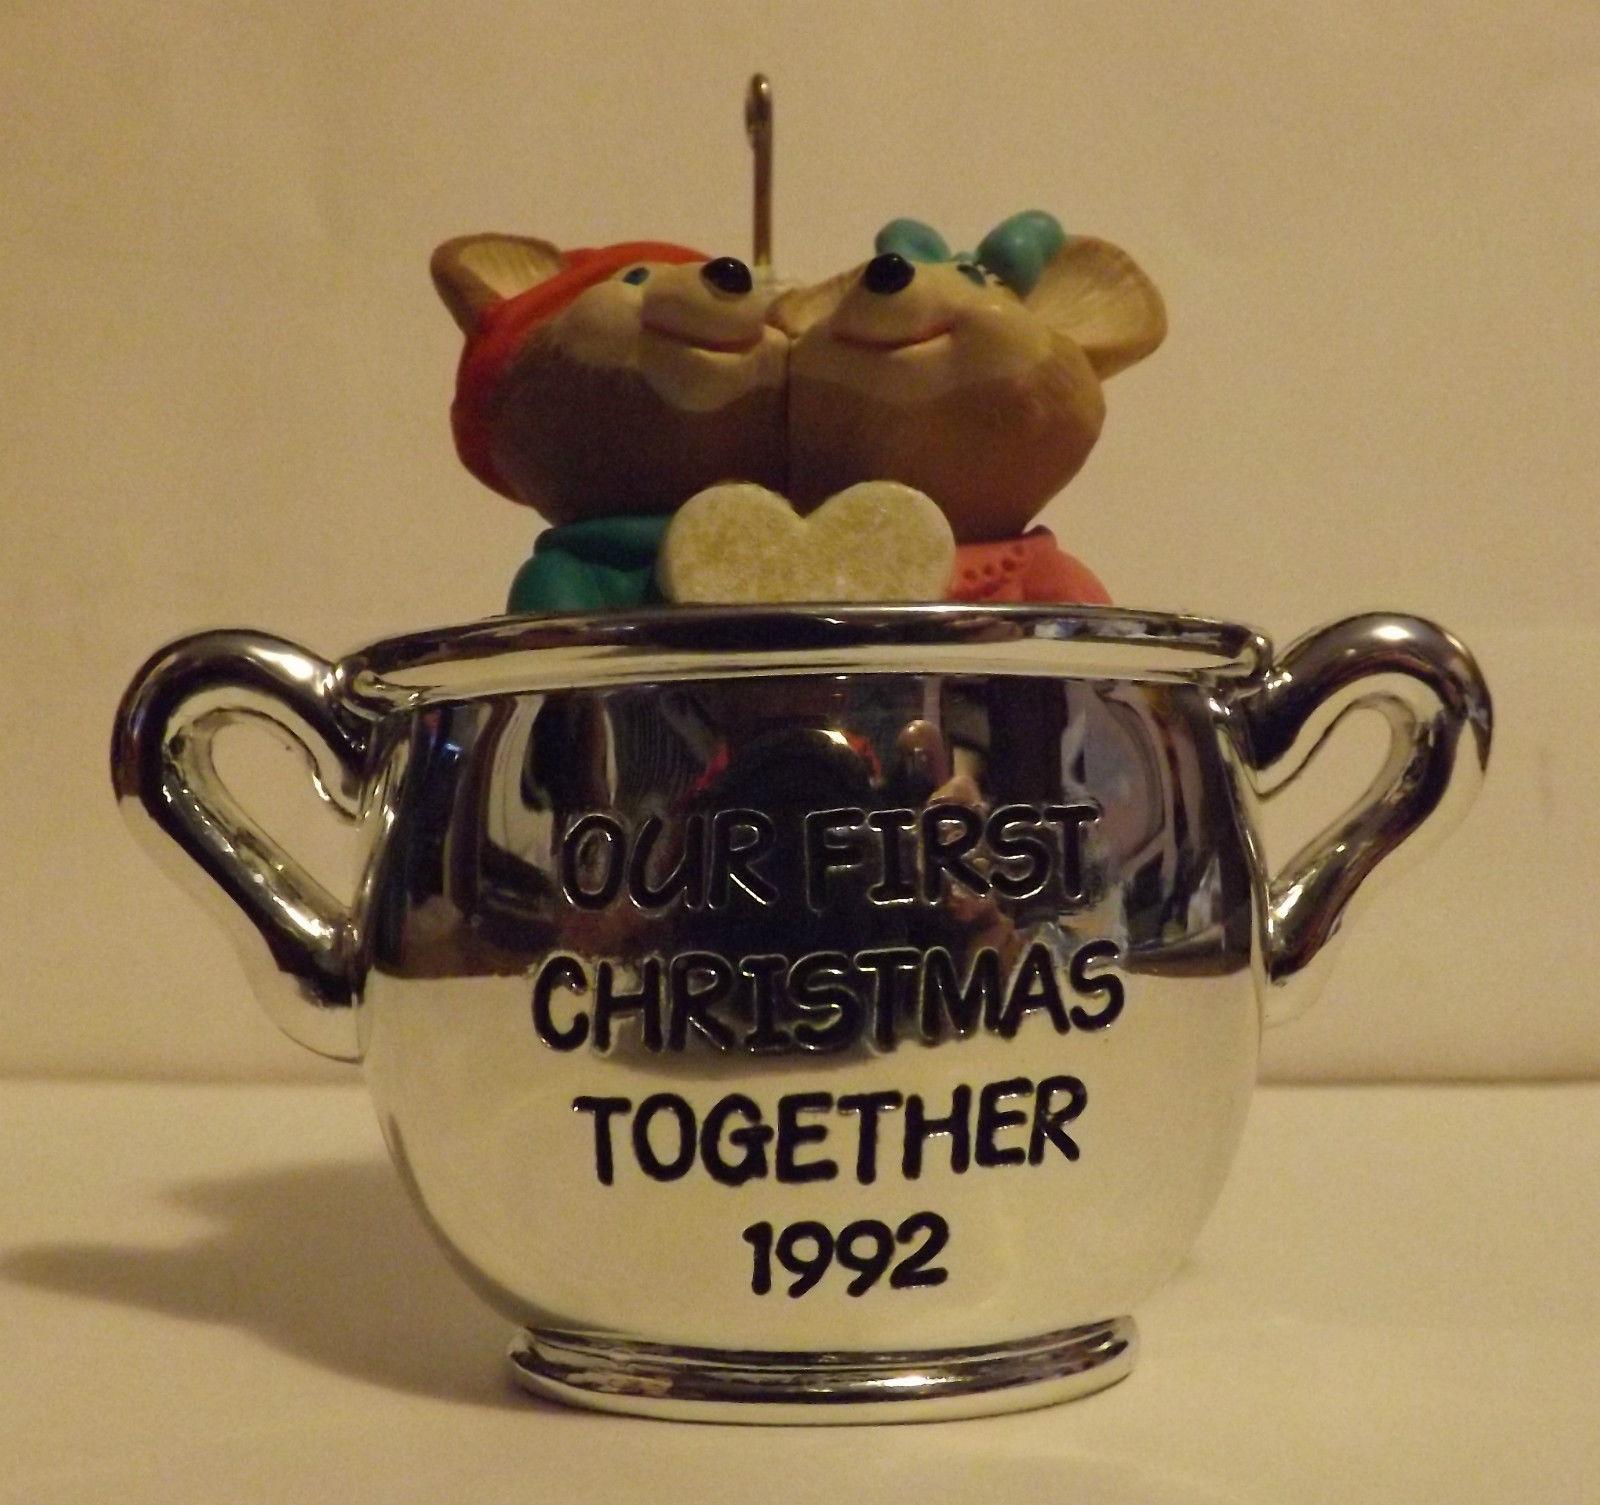 Hallmark Keepsake Ornament Our First Christmas Together 1992